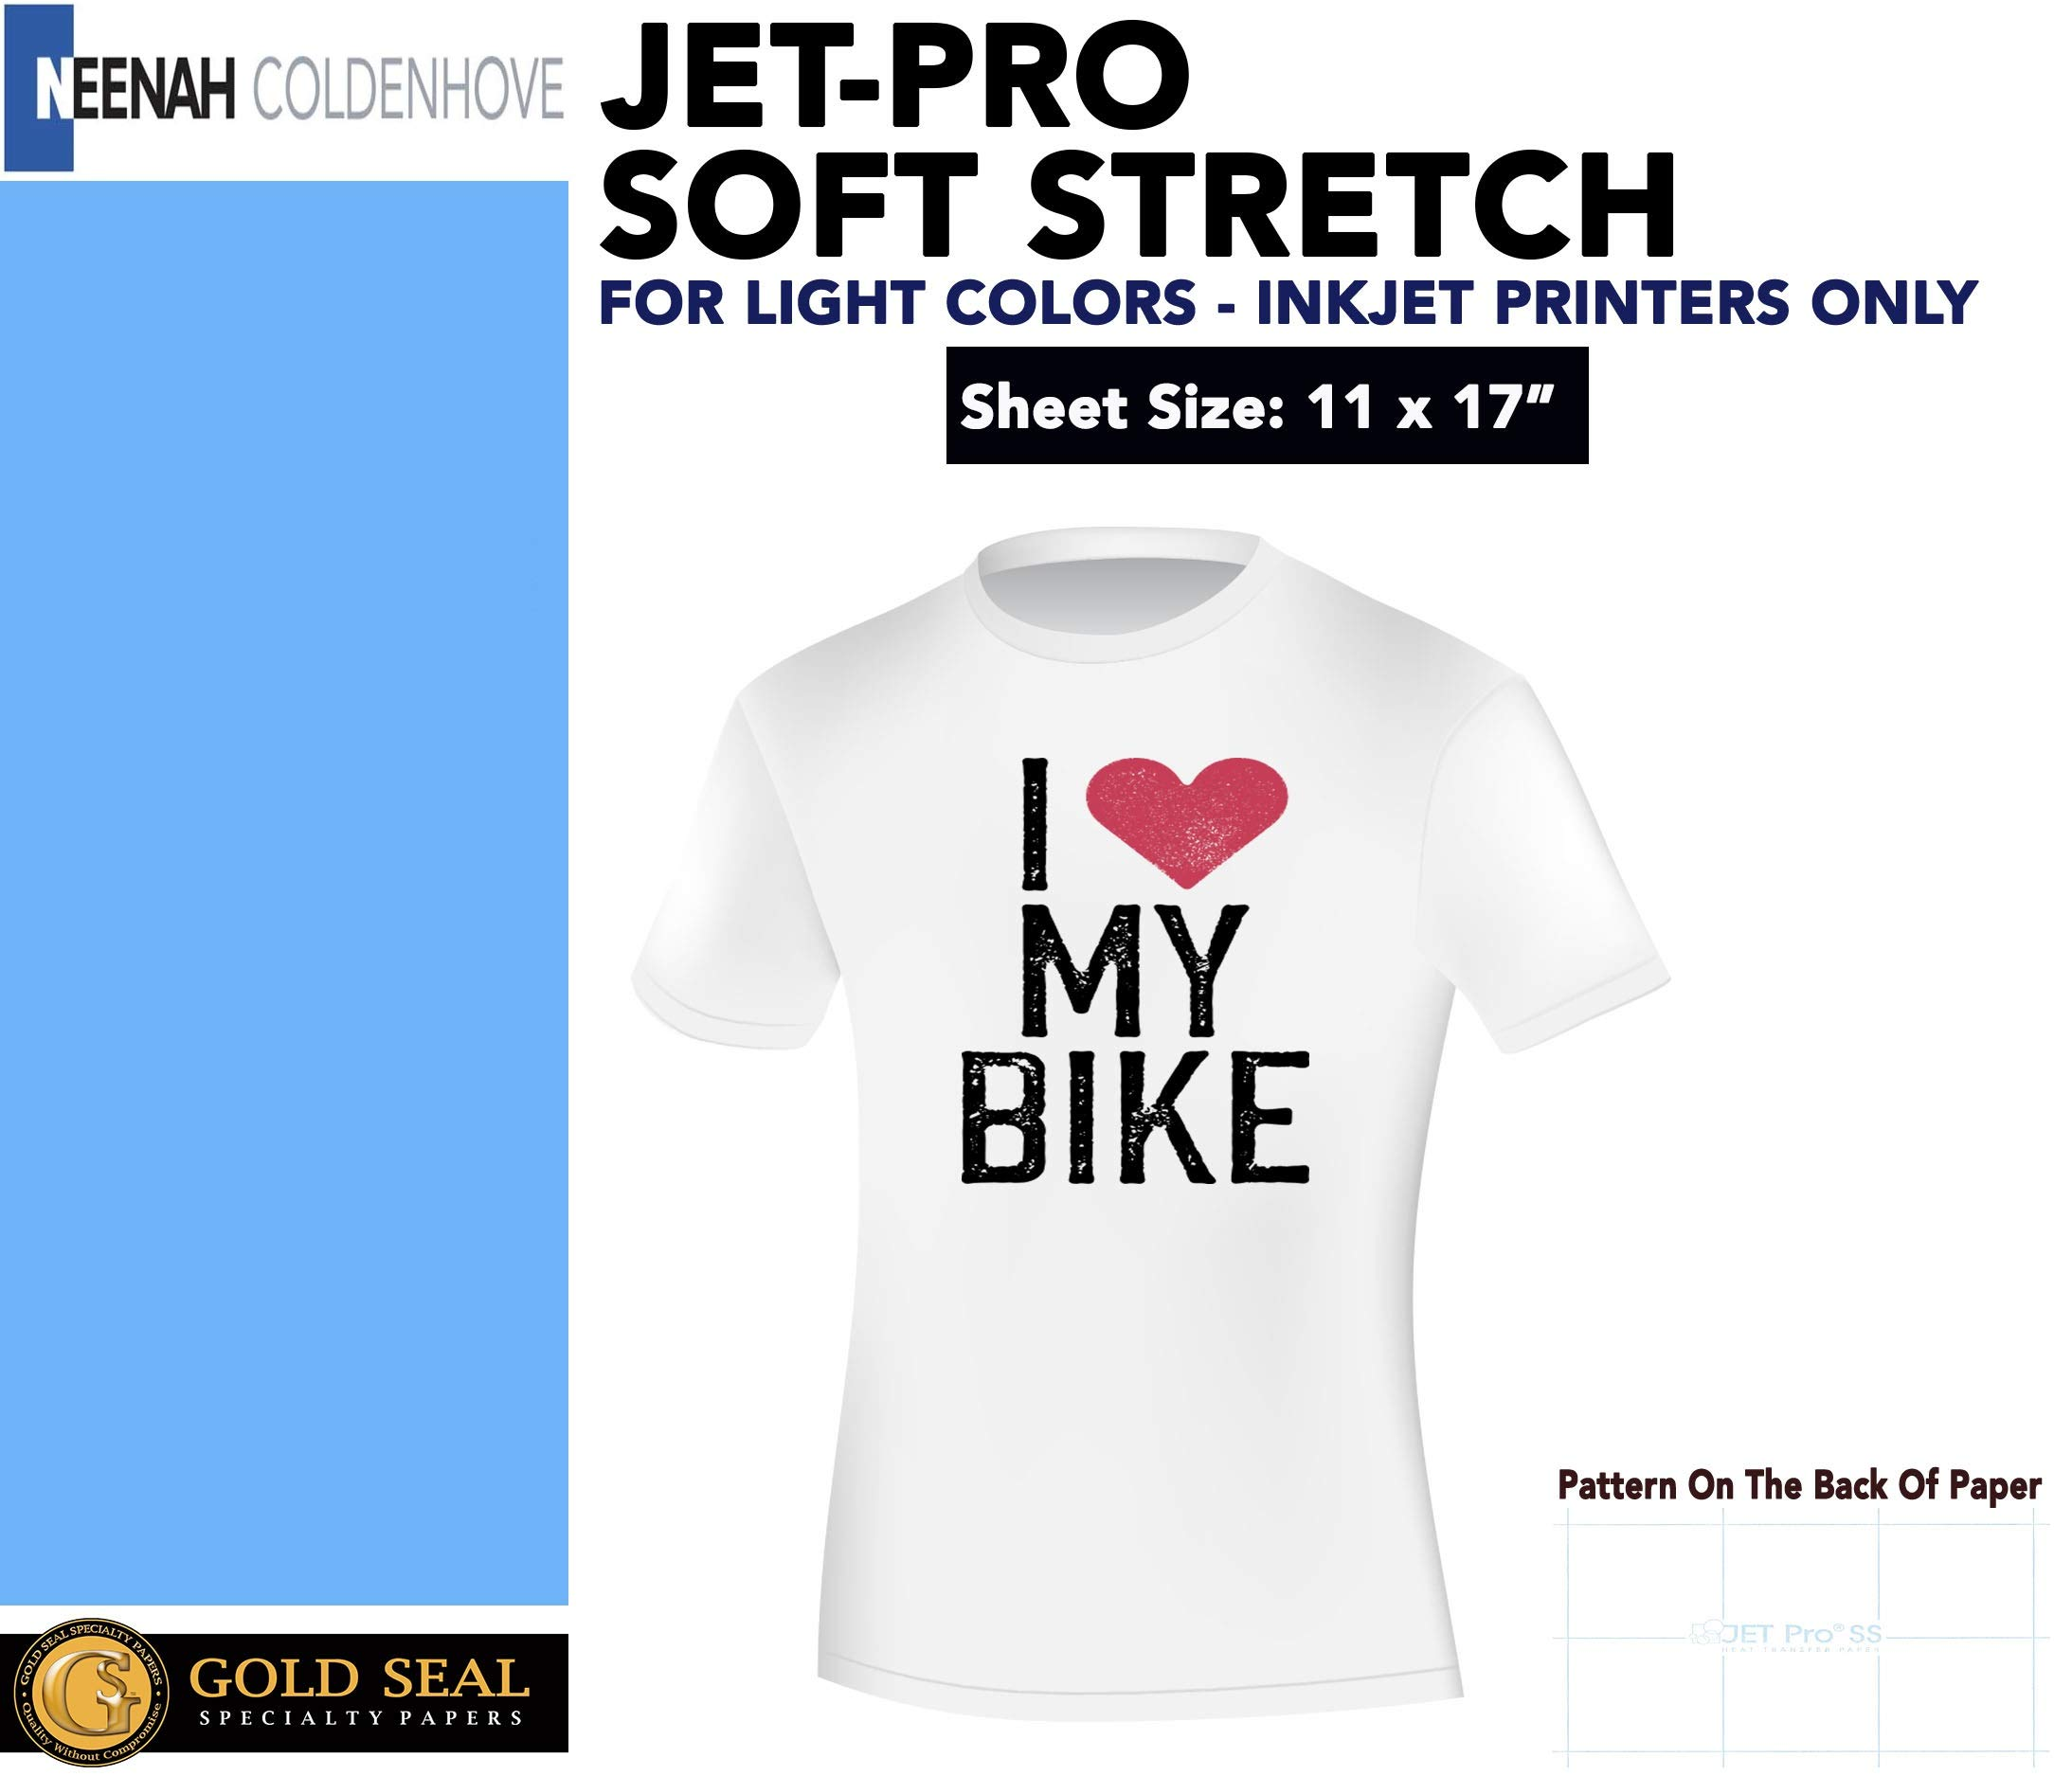 [JPSS - Jet-Pro SofStretch] Jetpro SS transfer paper 11''x 17'' (30 sheets) by Neenah